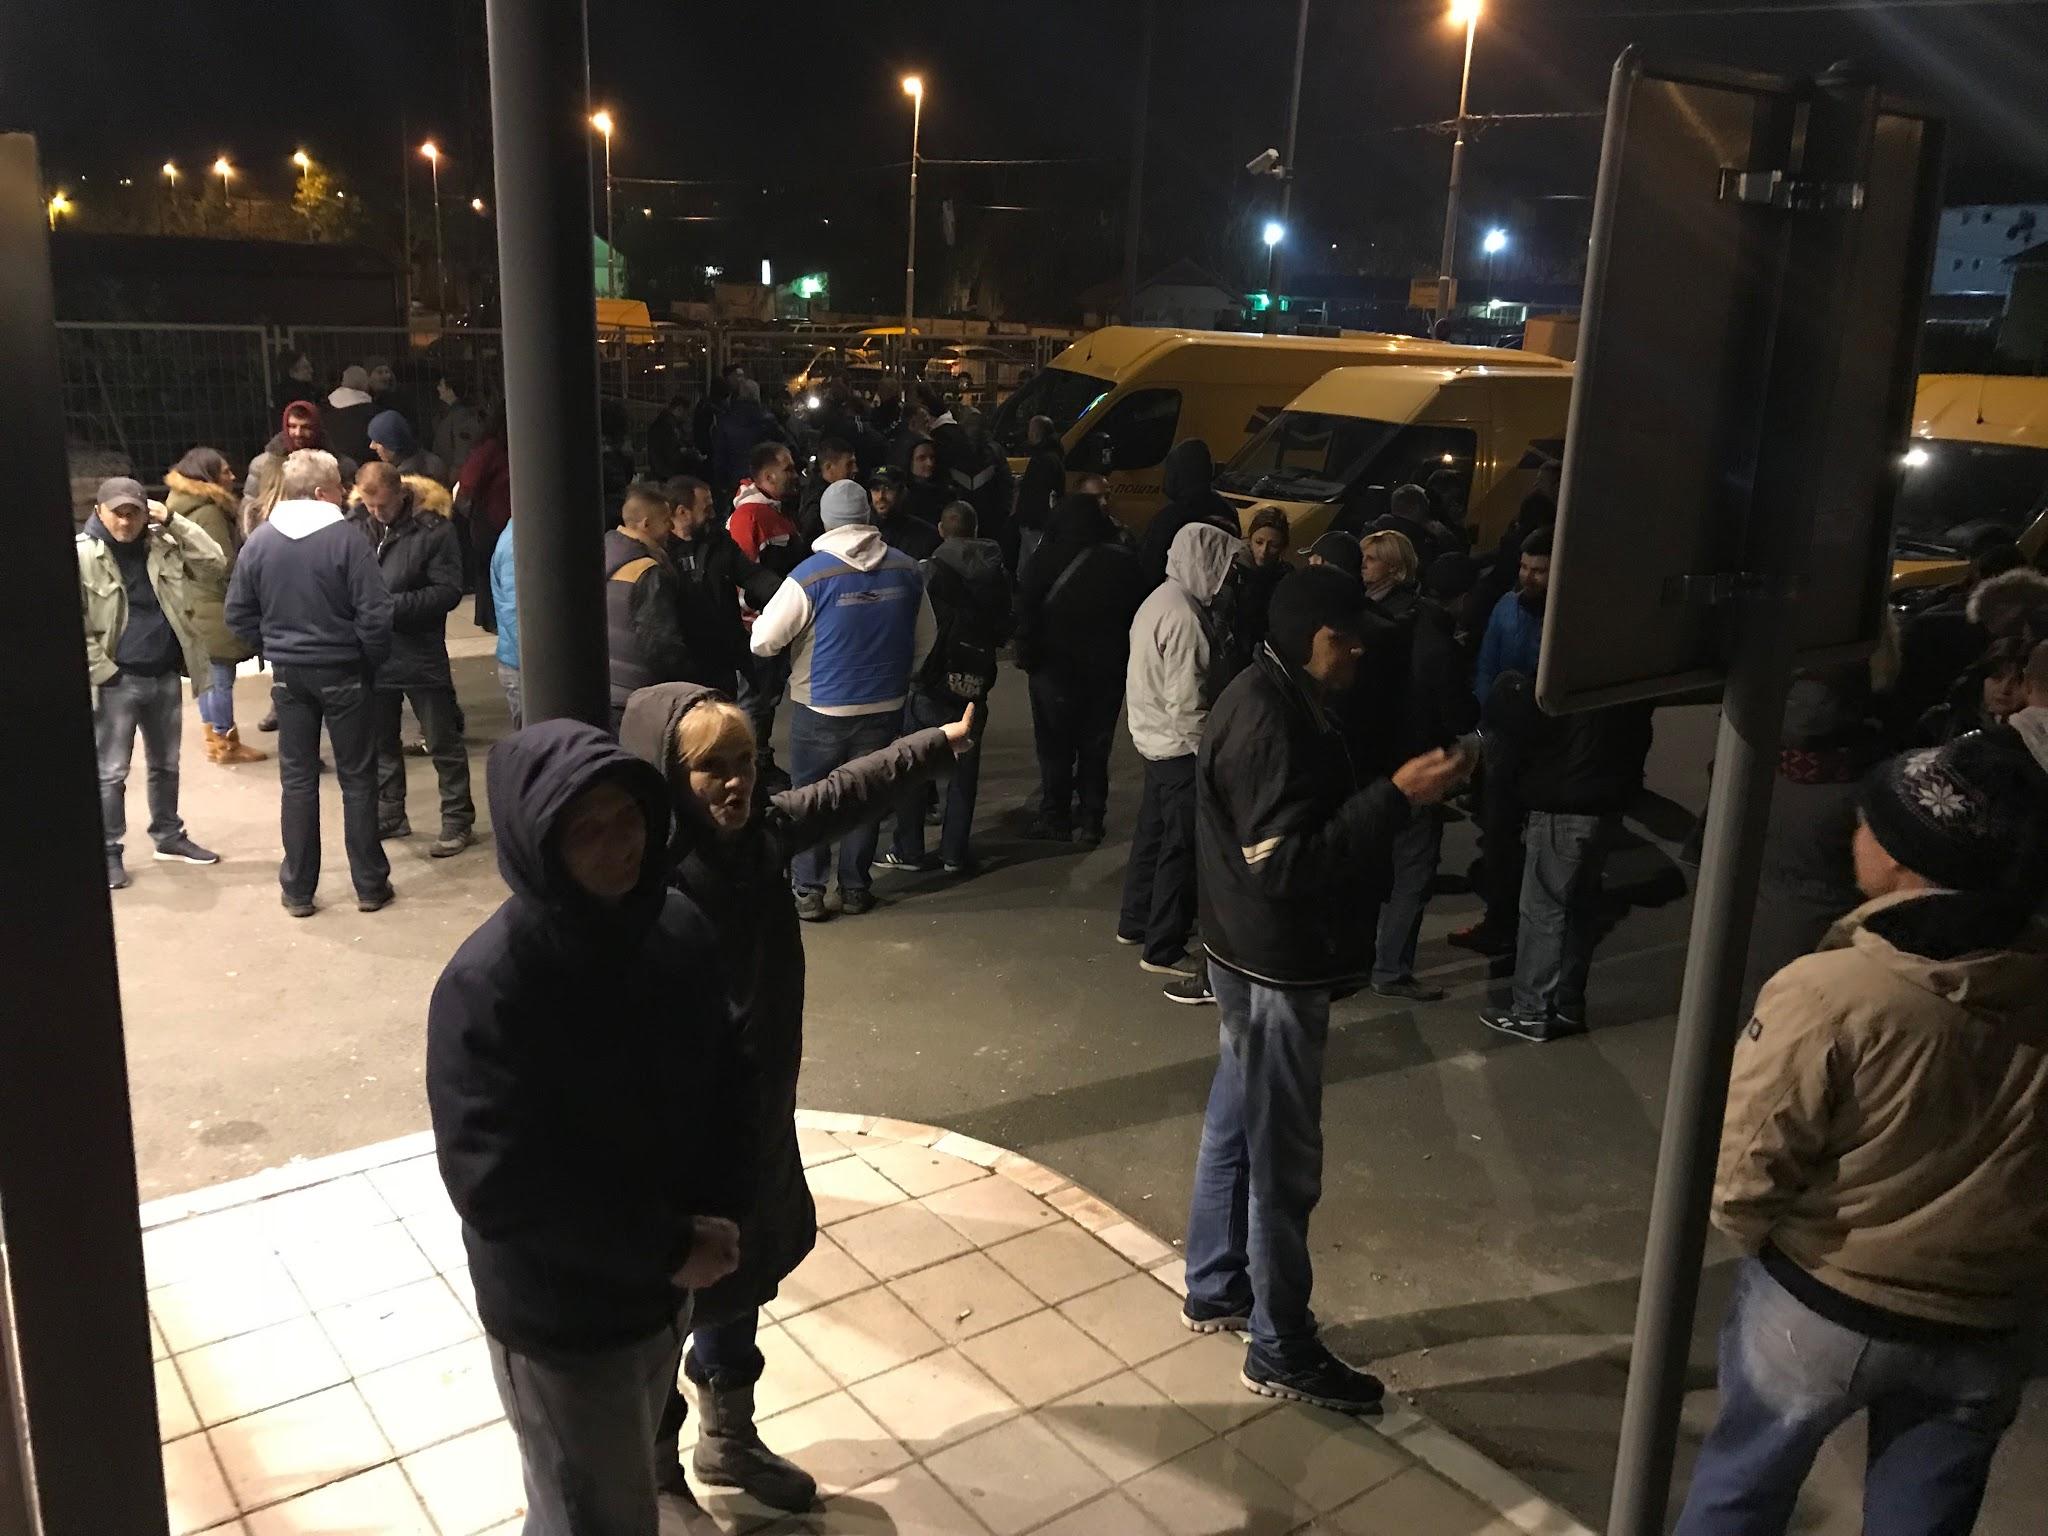 UDRI-PO-SIROTINJI-7-policijskih-marica-doslo-da-hapsi-radnike-Poste-na-protestu-FOTO